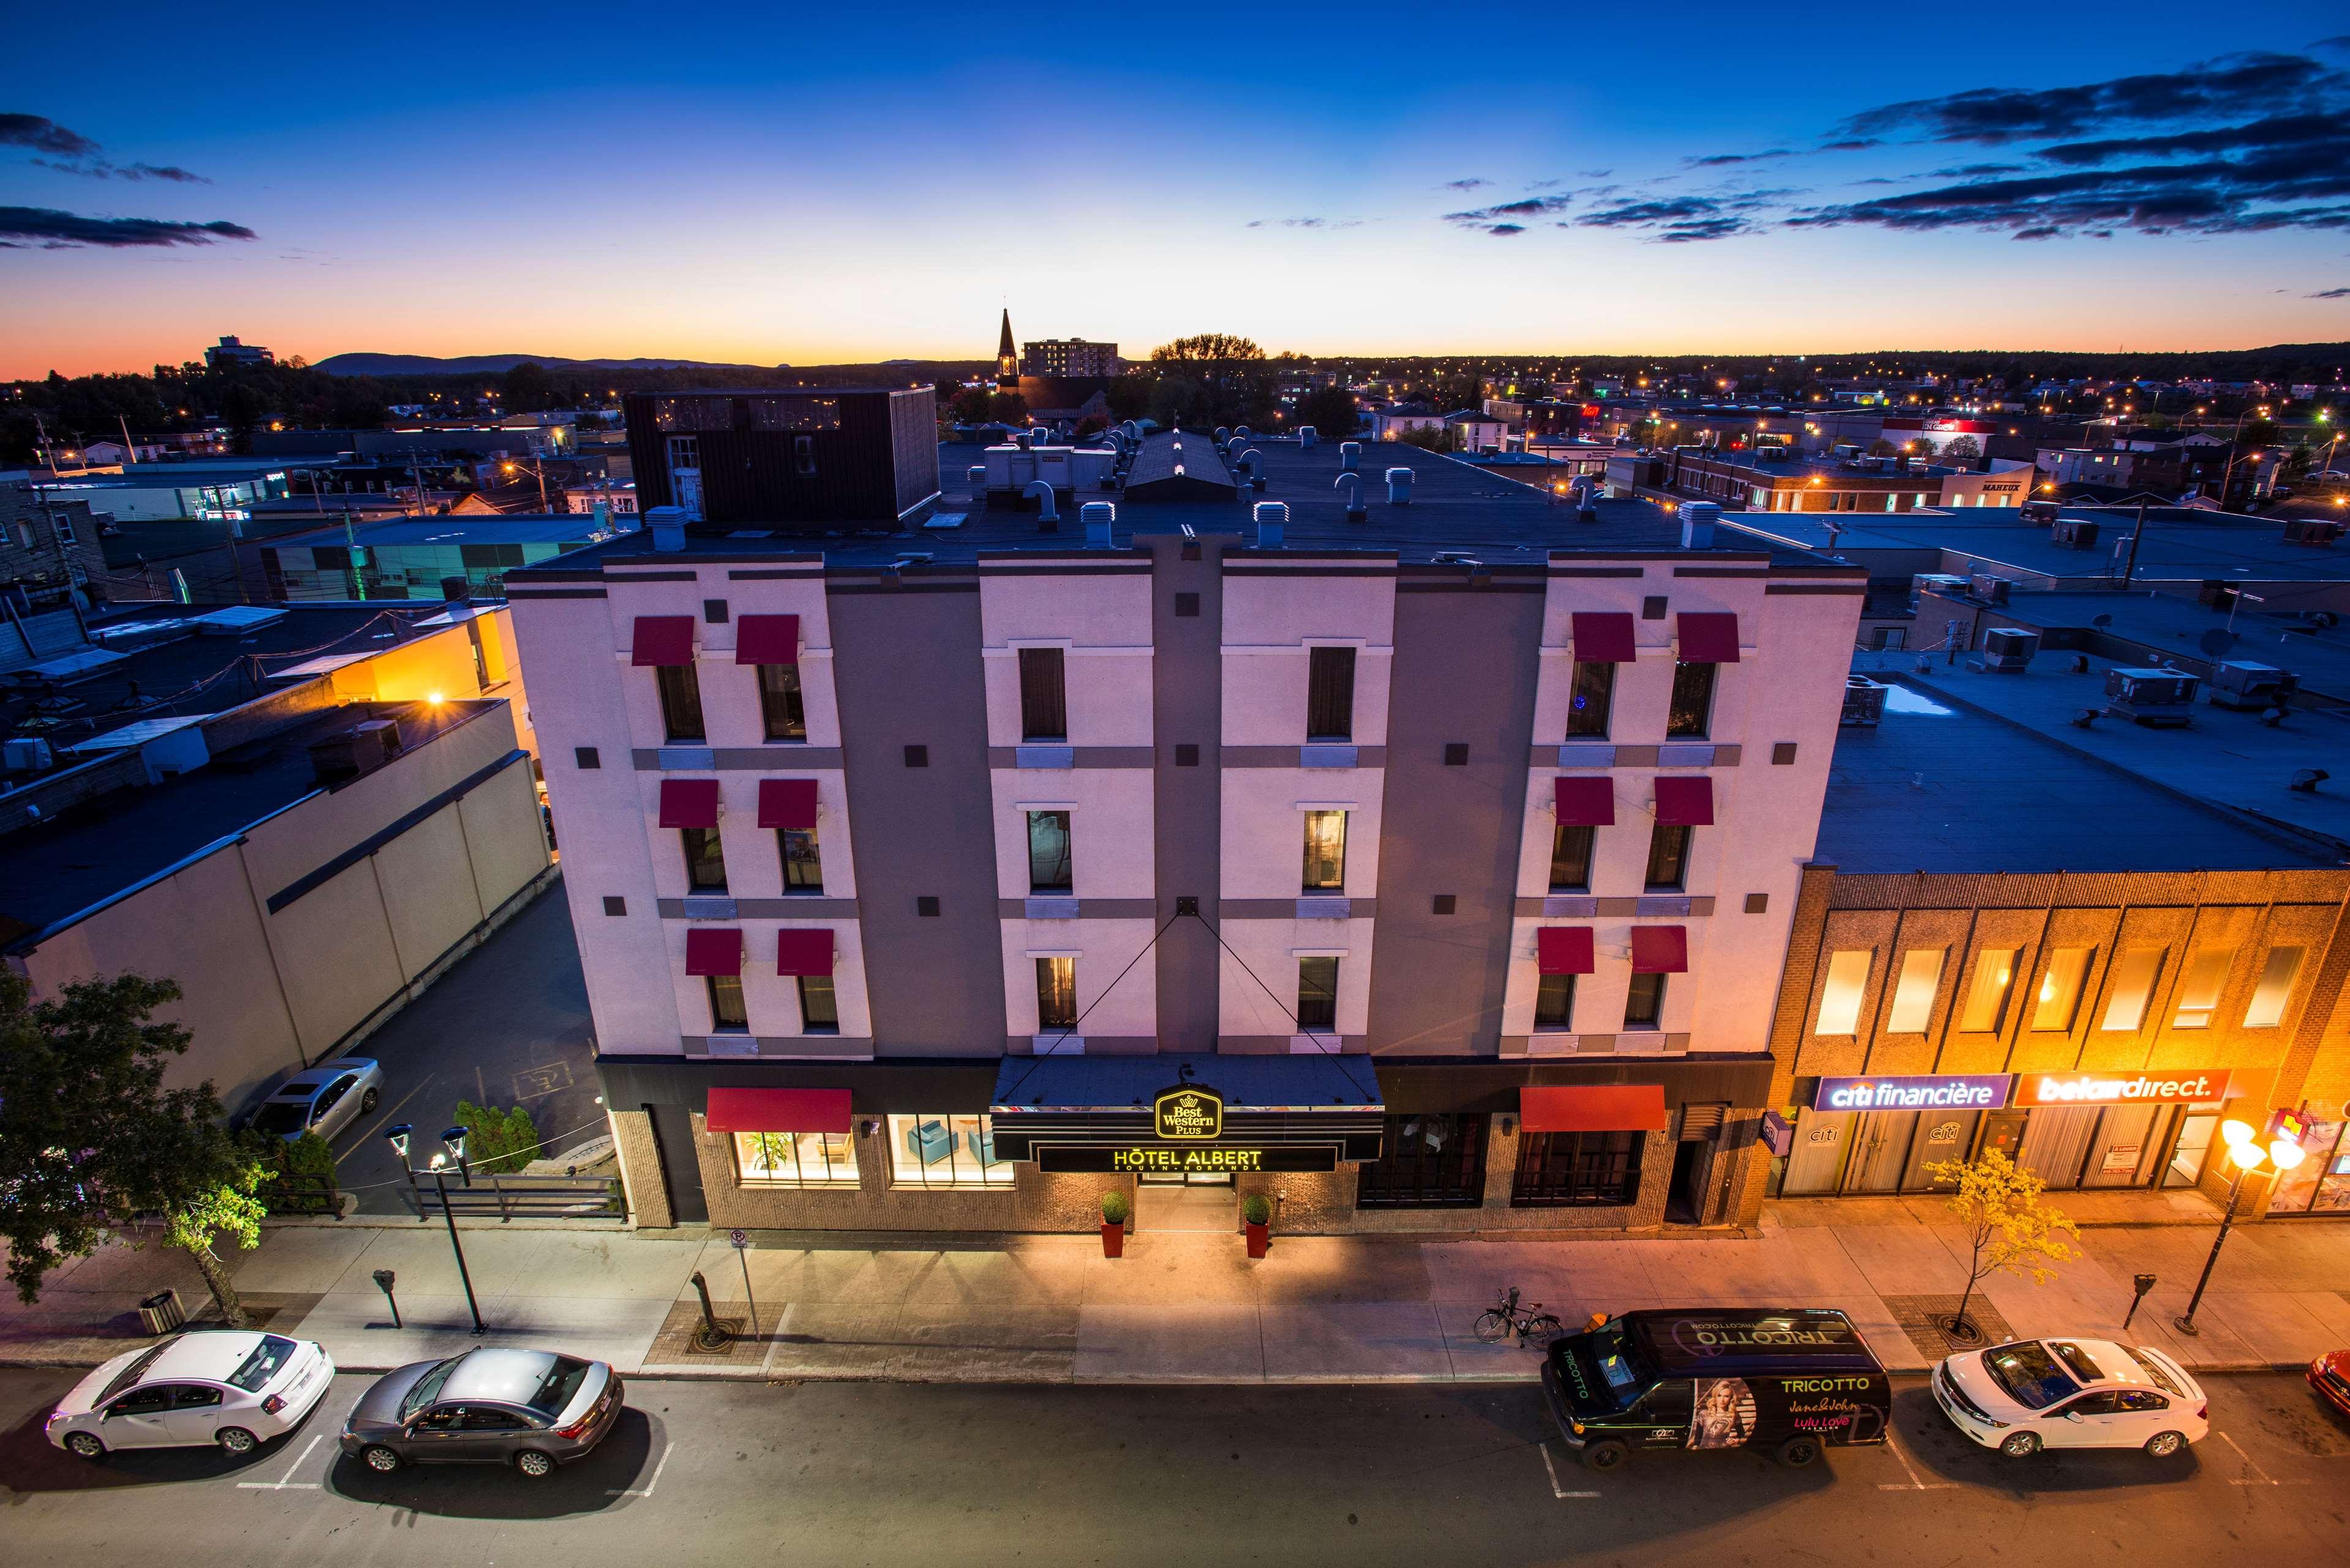 Best Western Plus Hotel Albert Rouyn-Noranda à Rouyn-Noranda: Exterior